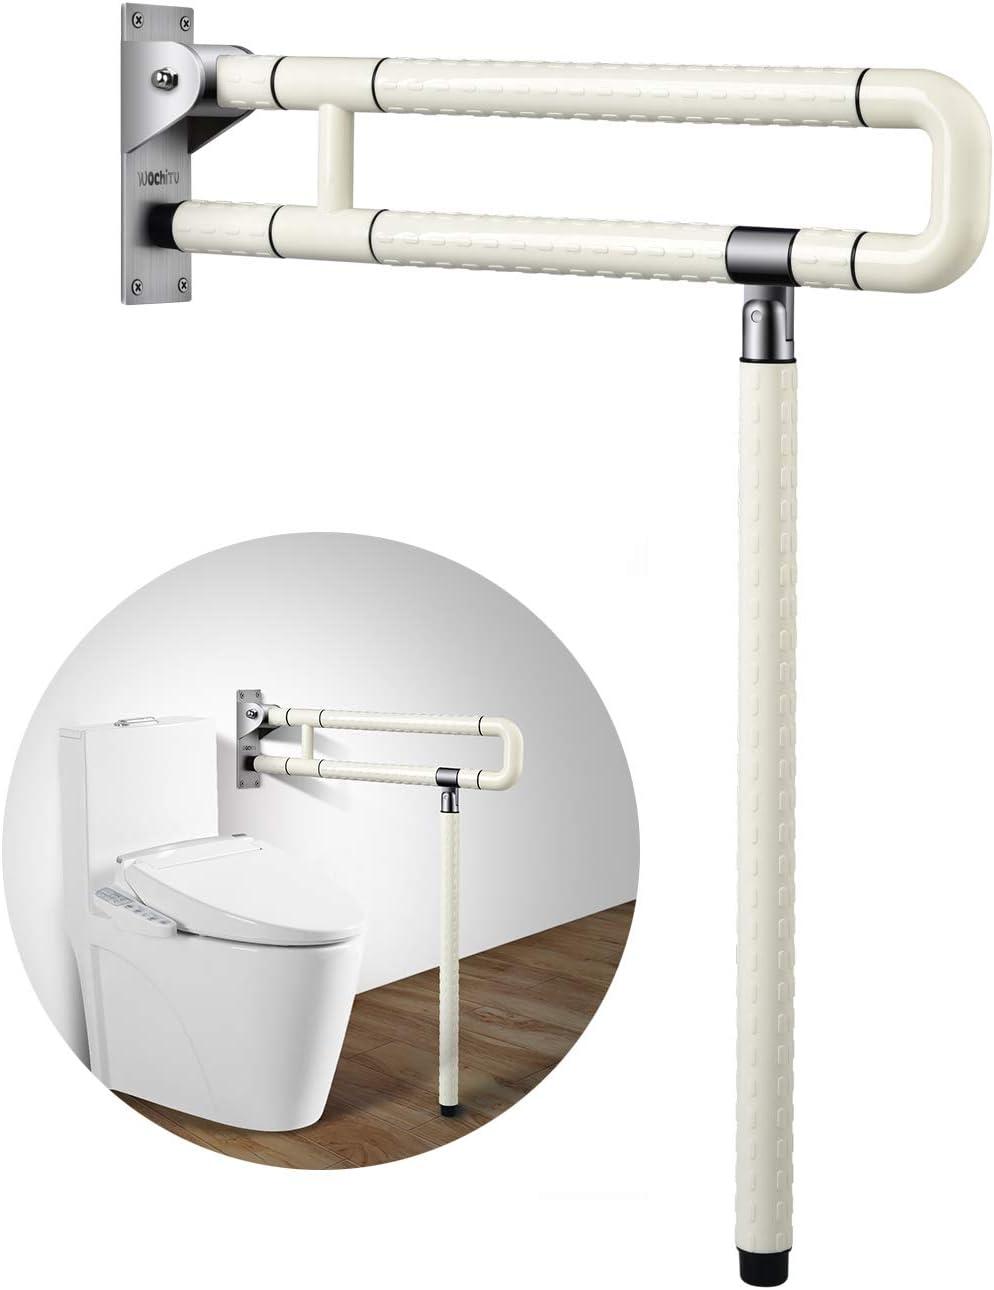 Bathroom Toilet Safety Rails, Bathroom Handicap Rails